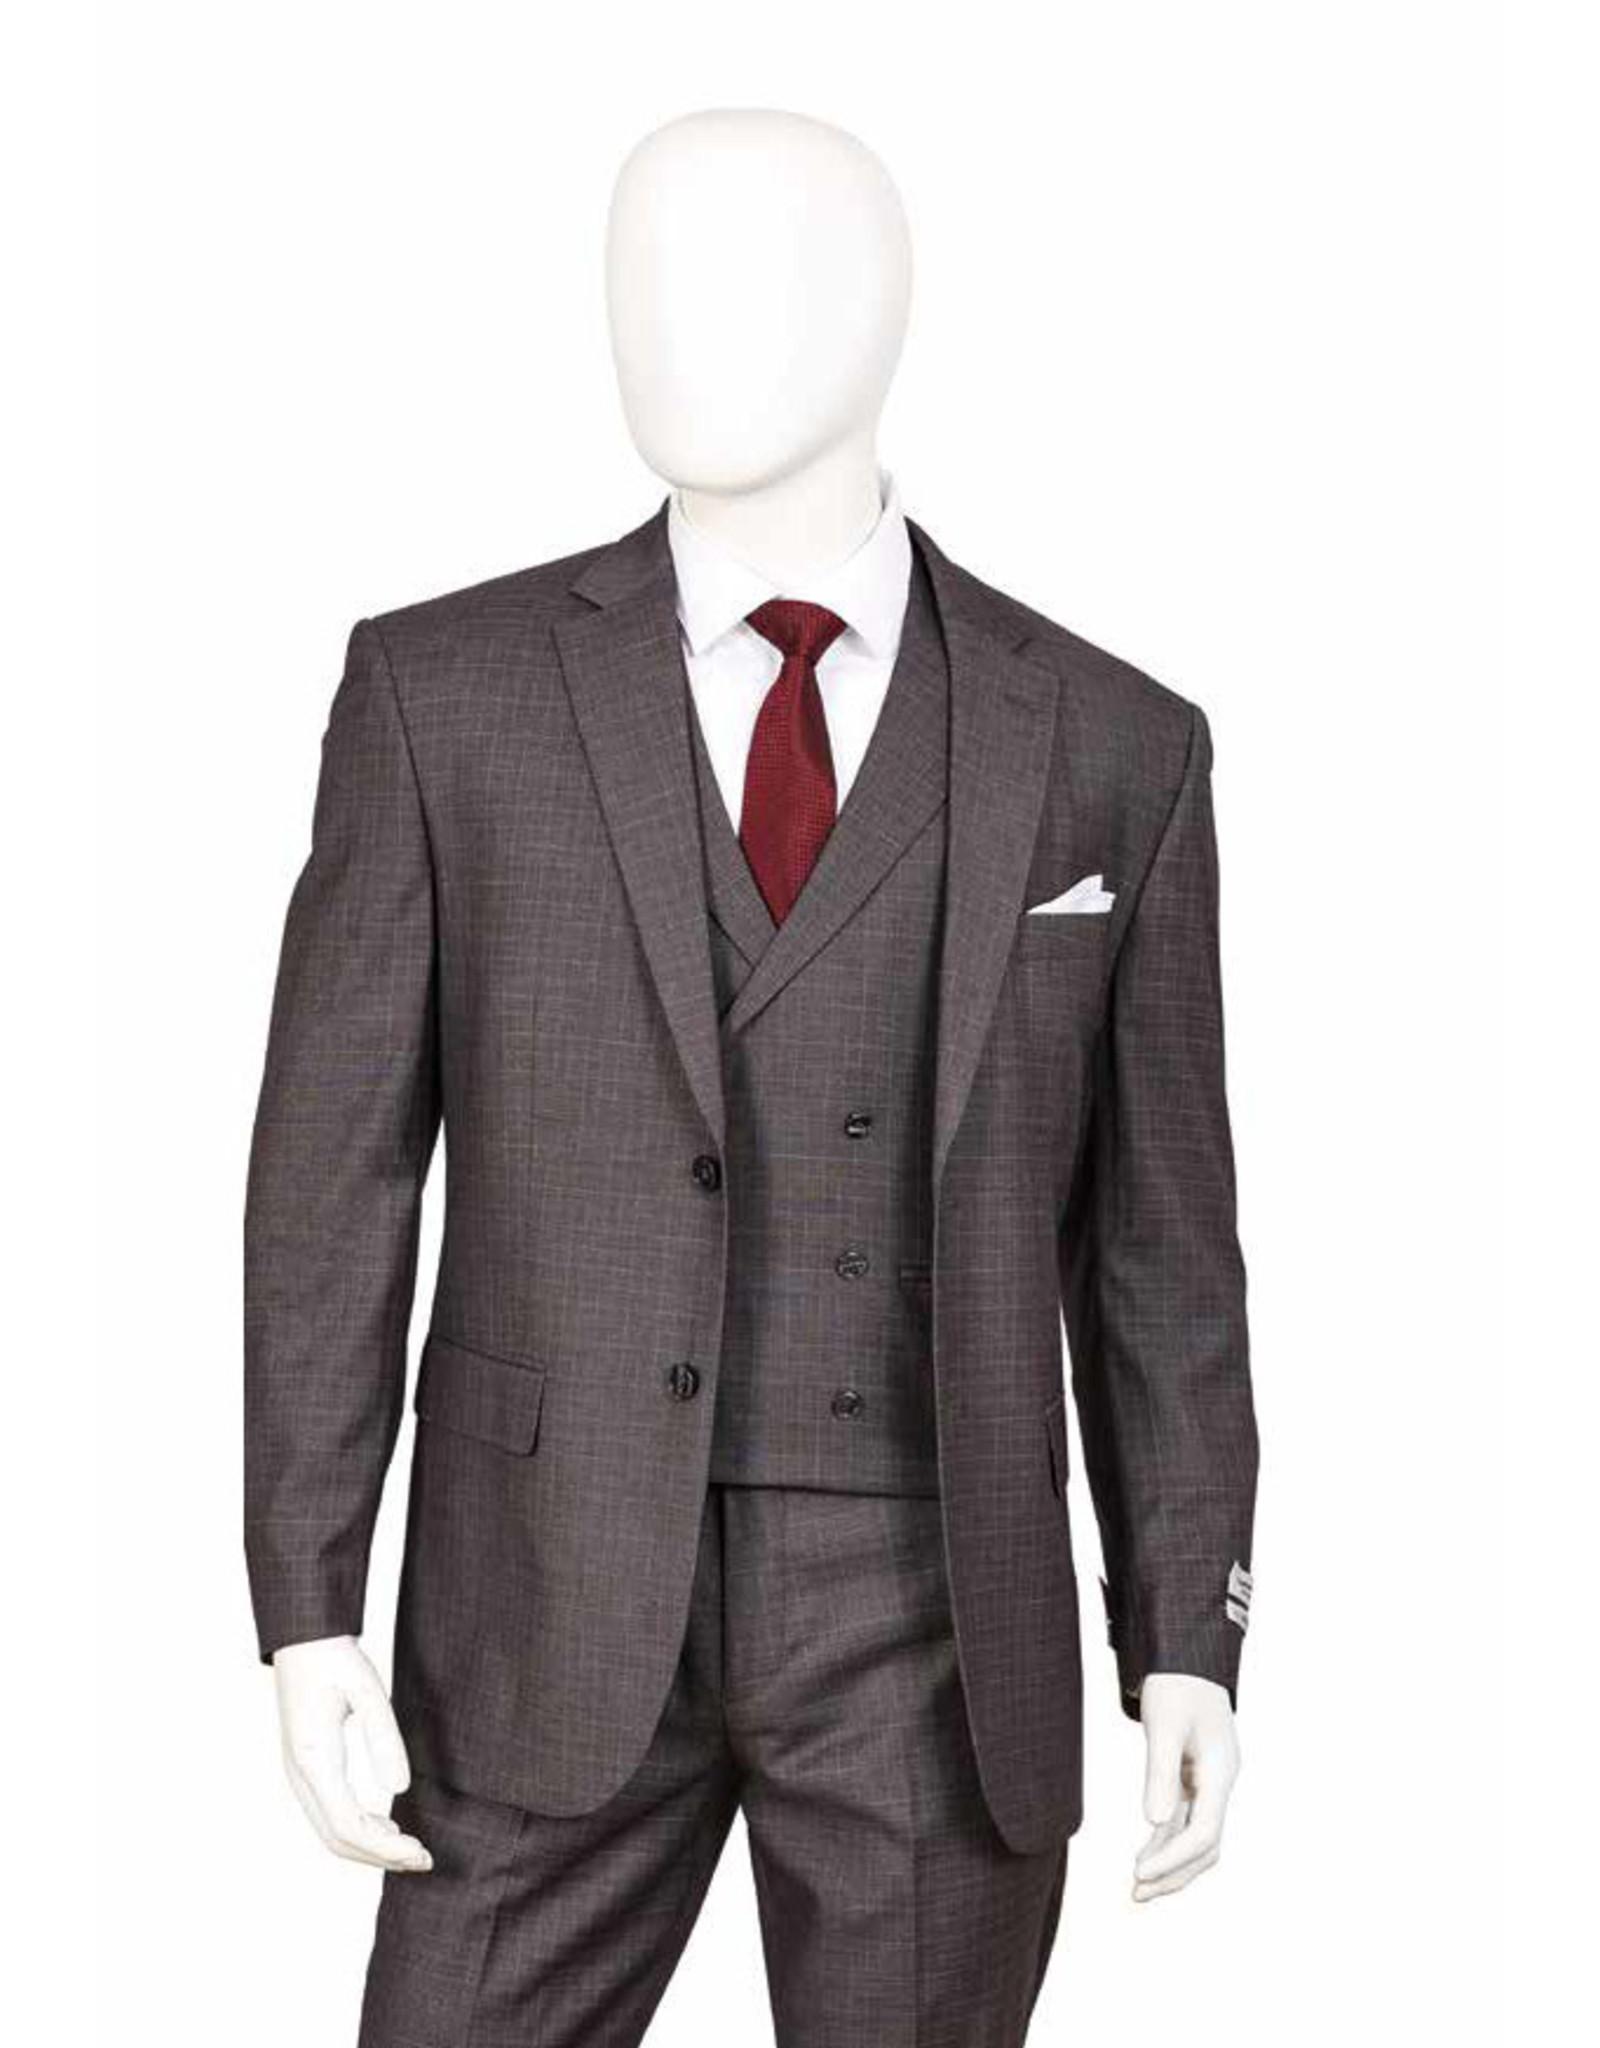 Lorenzo Bruno Lorenzo Bruno Vested Suit - F62SQ Gray